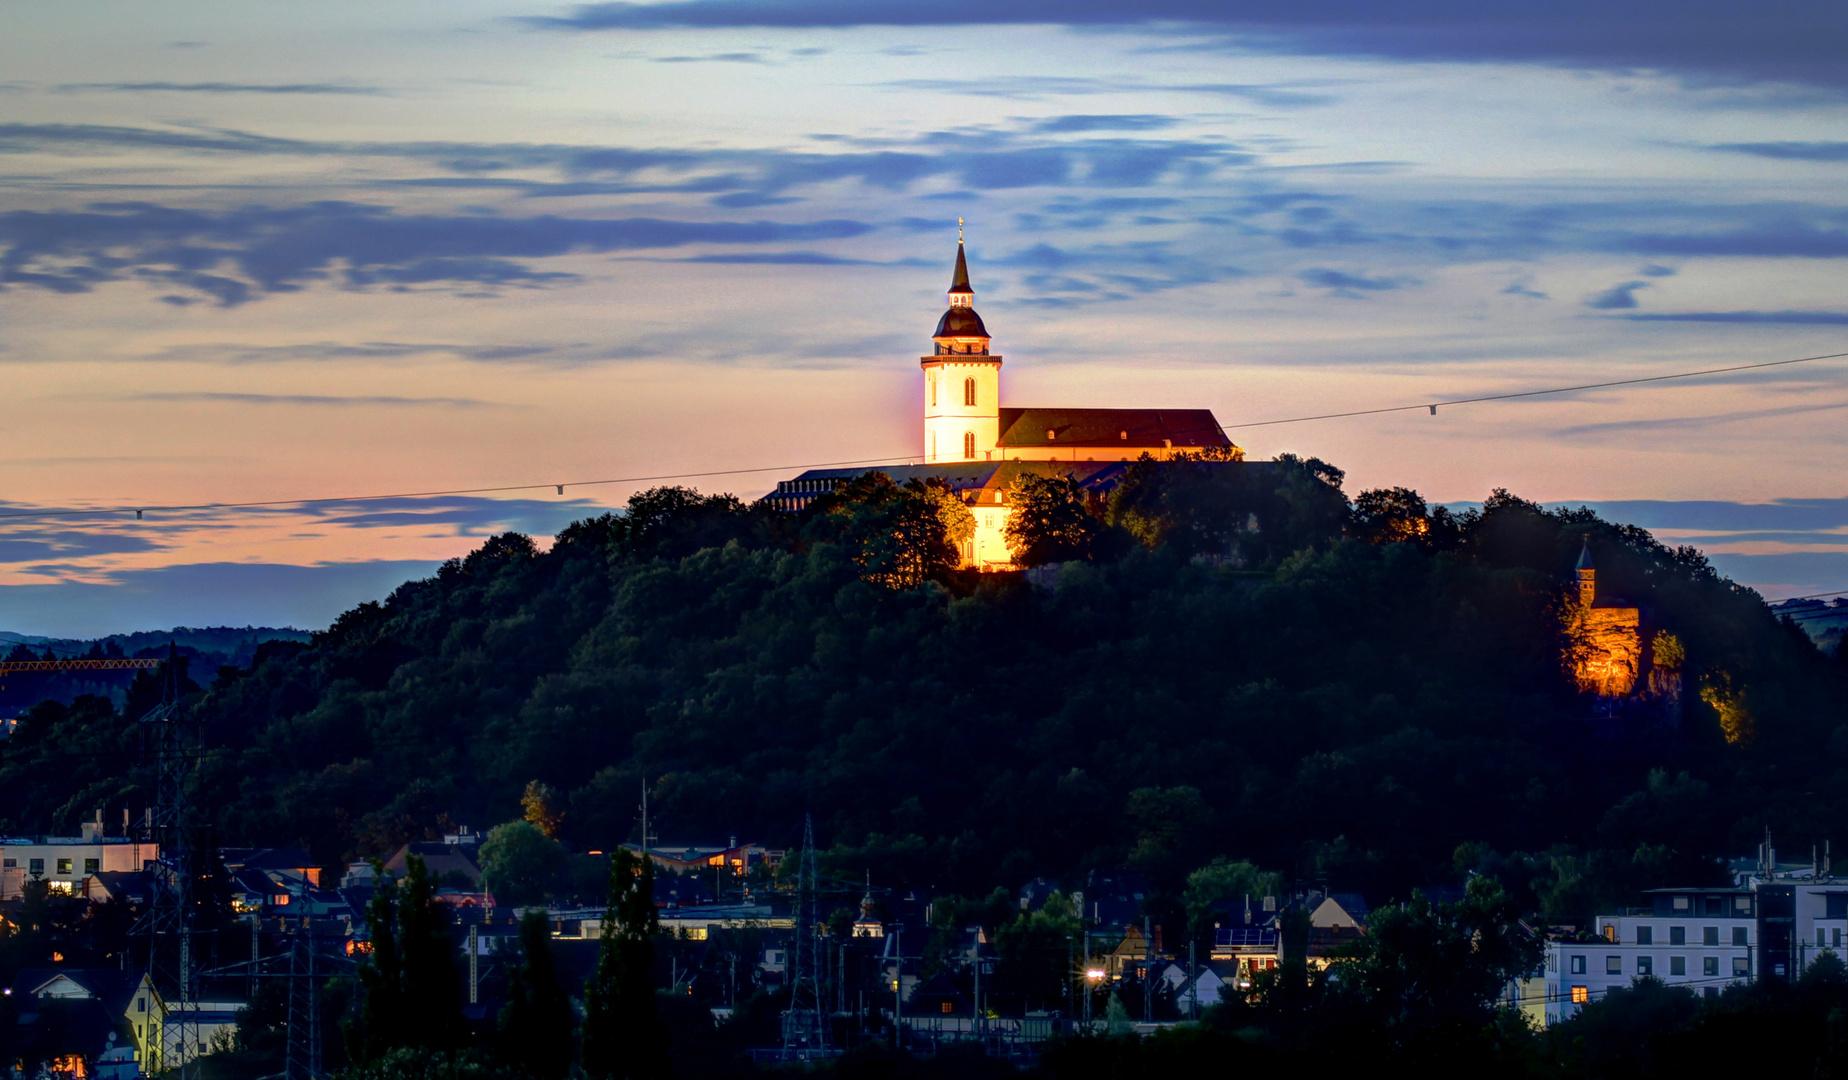 Michelsberg bei Siegburg